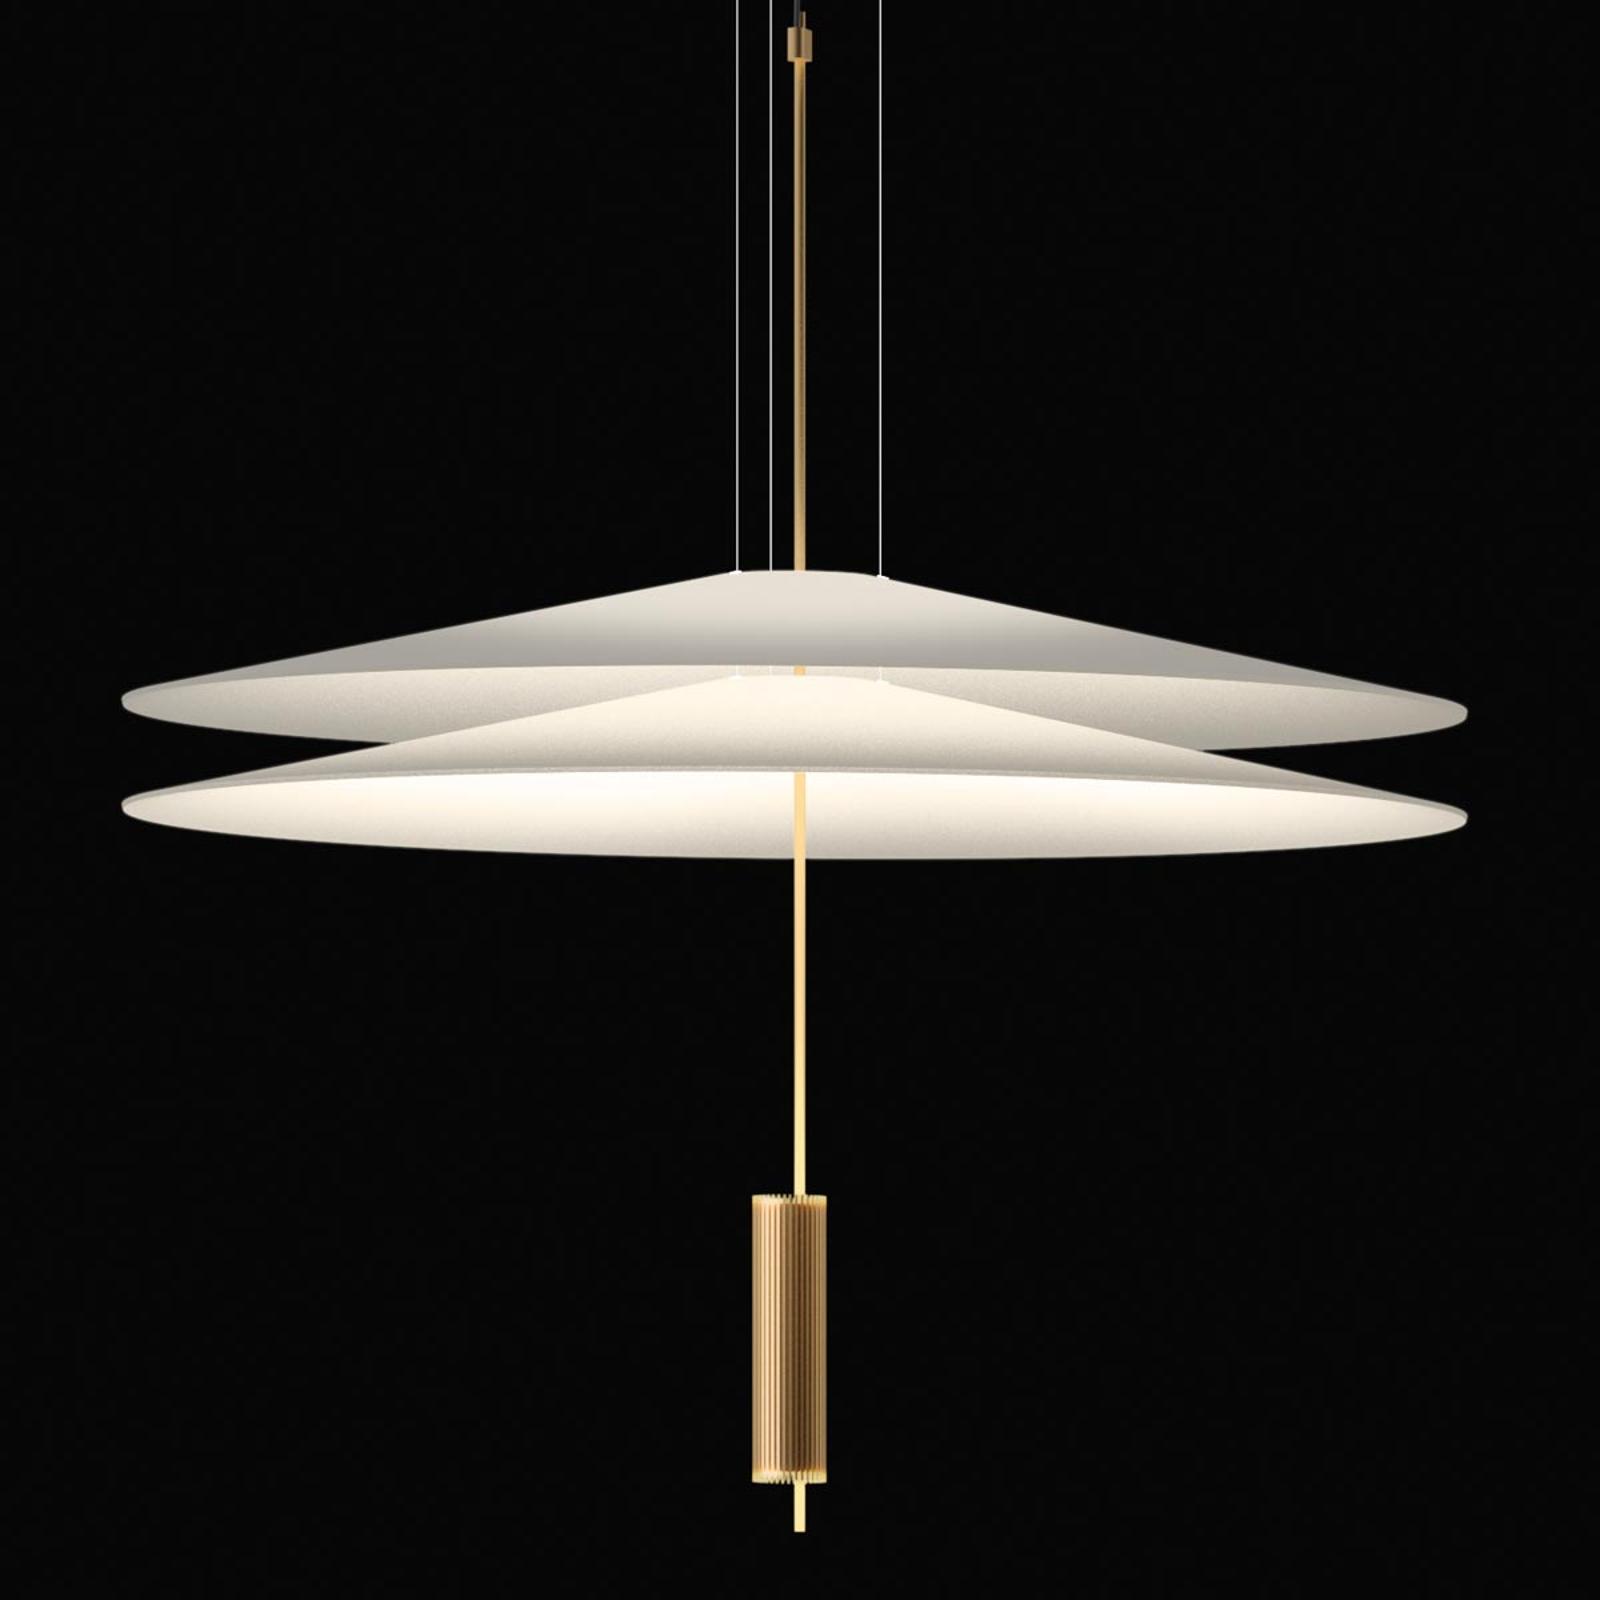 Vibia Flamingo - LED-Pendelleuchte 2 Schirme, gold